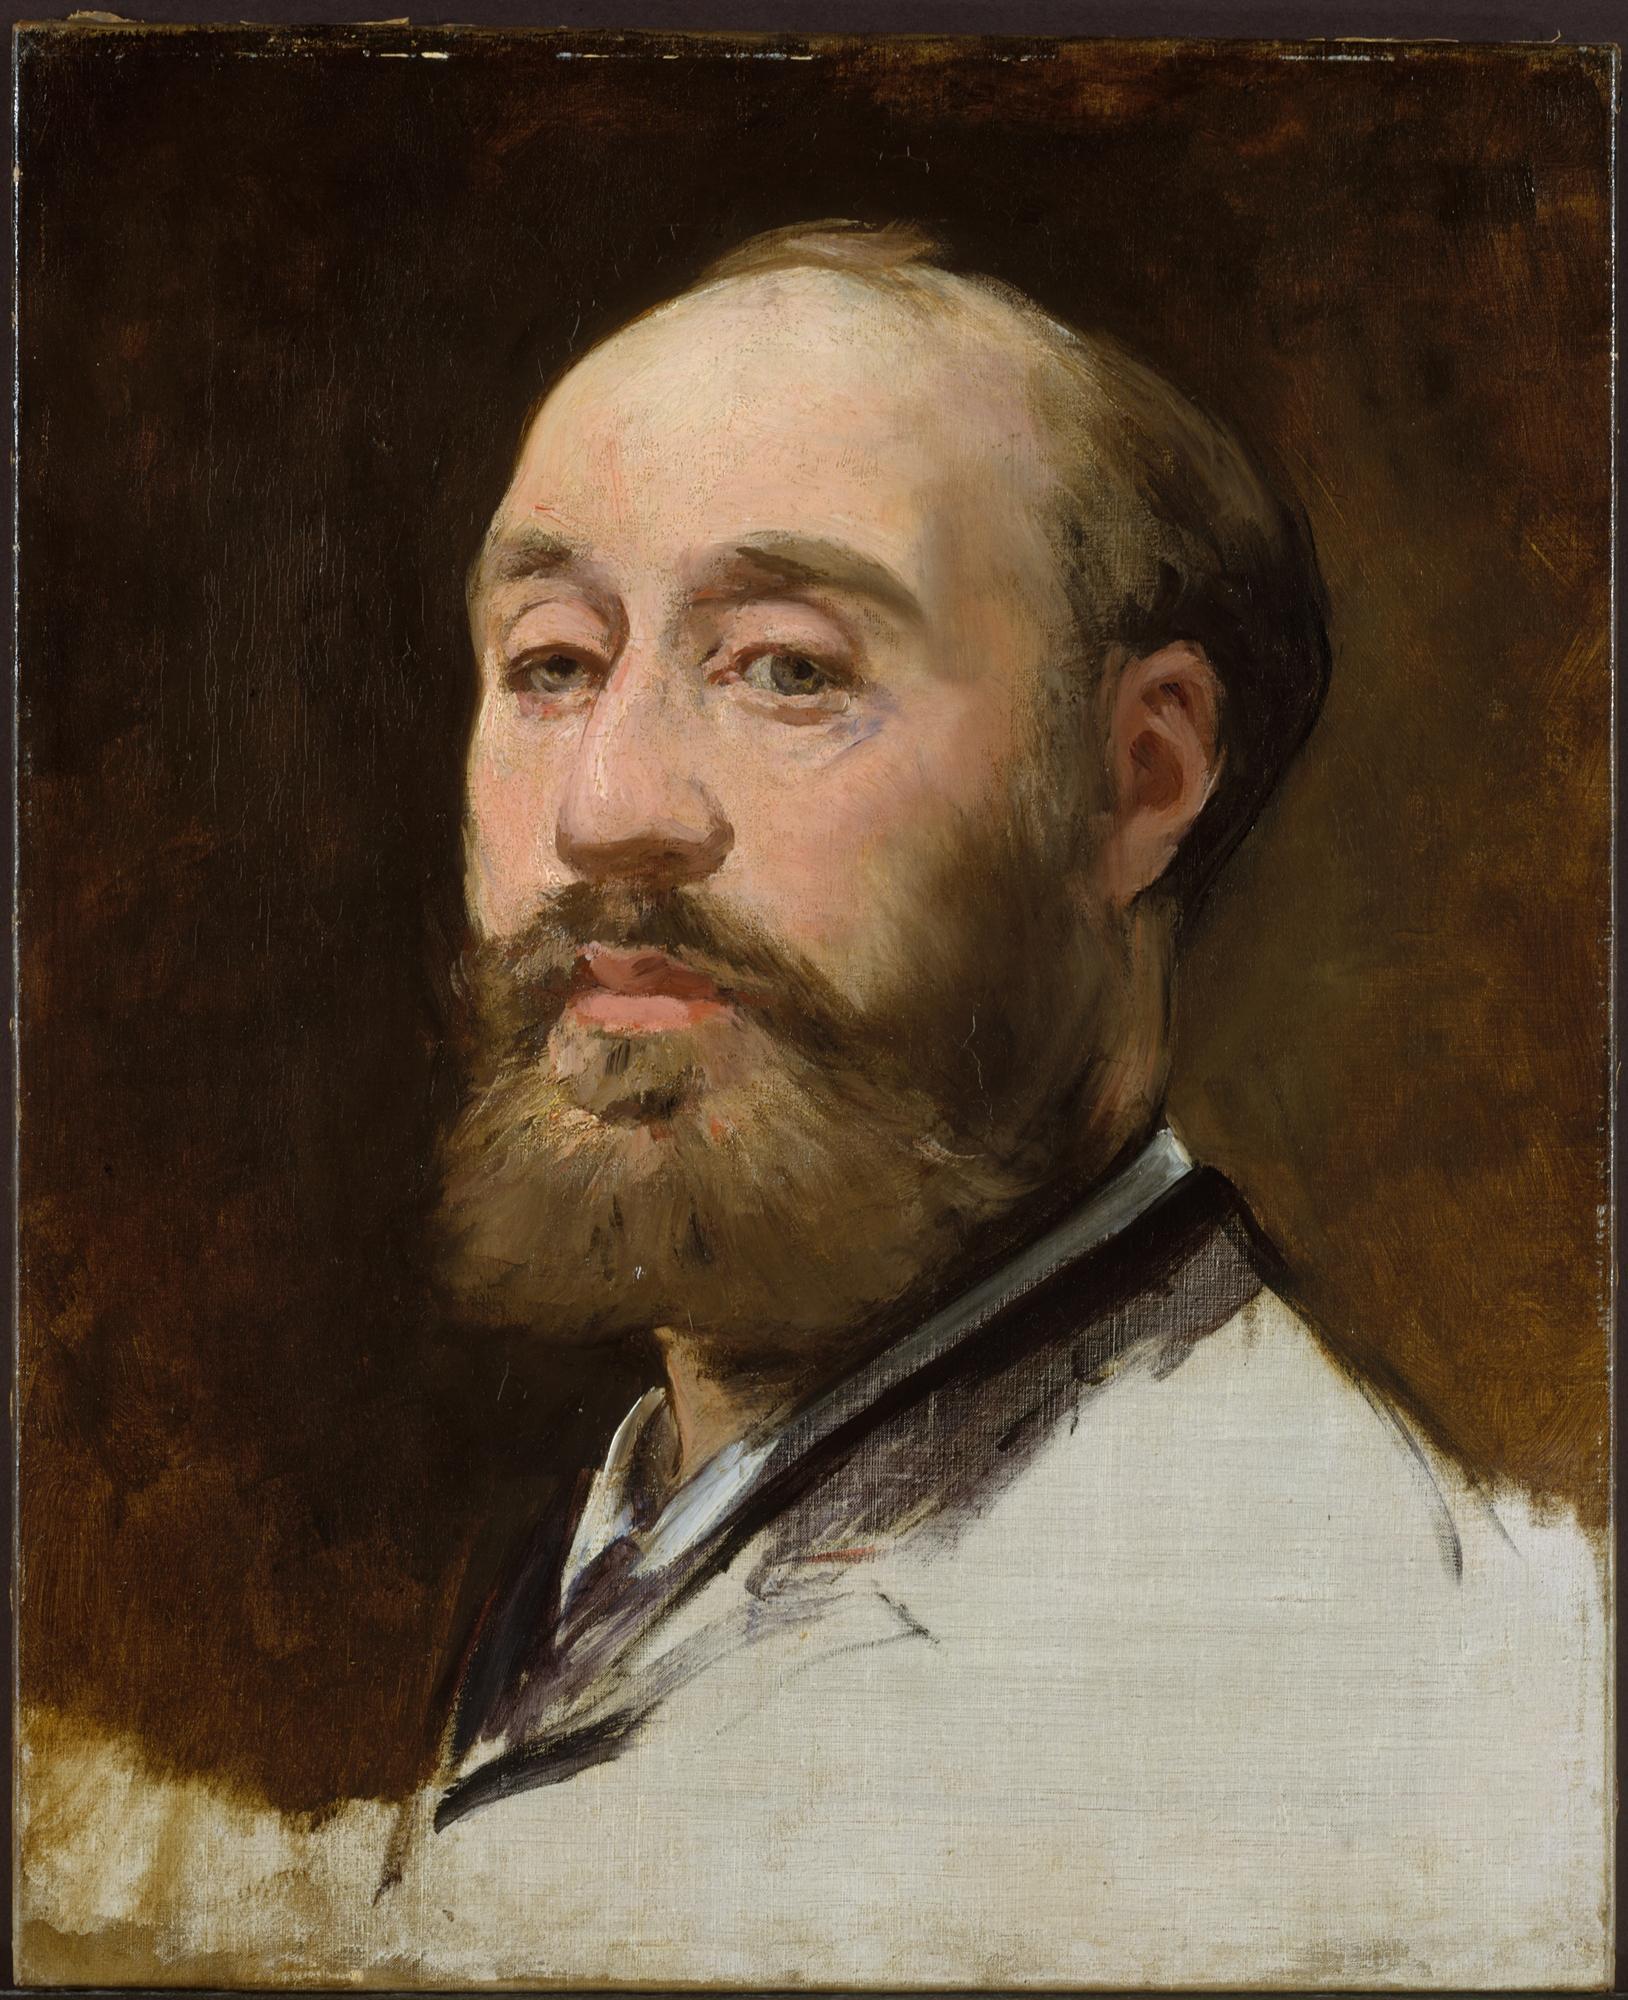 Jean-Baptiste Faure